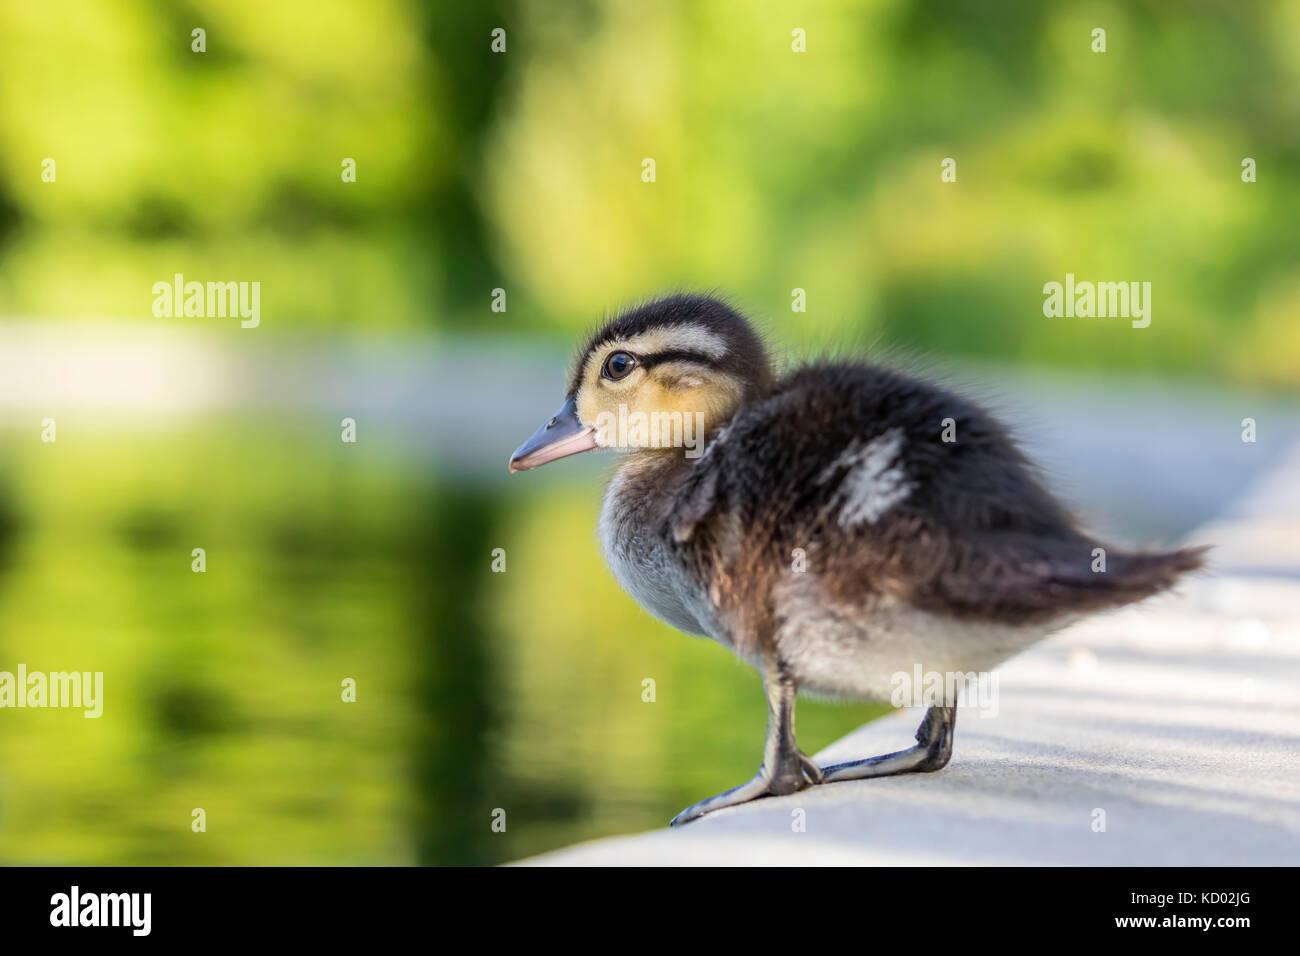 wood duck duckling stock photos u0026 wood duck duckling stock images